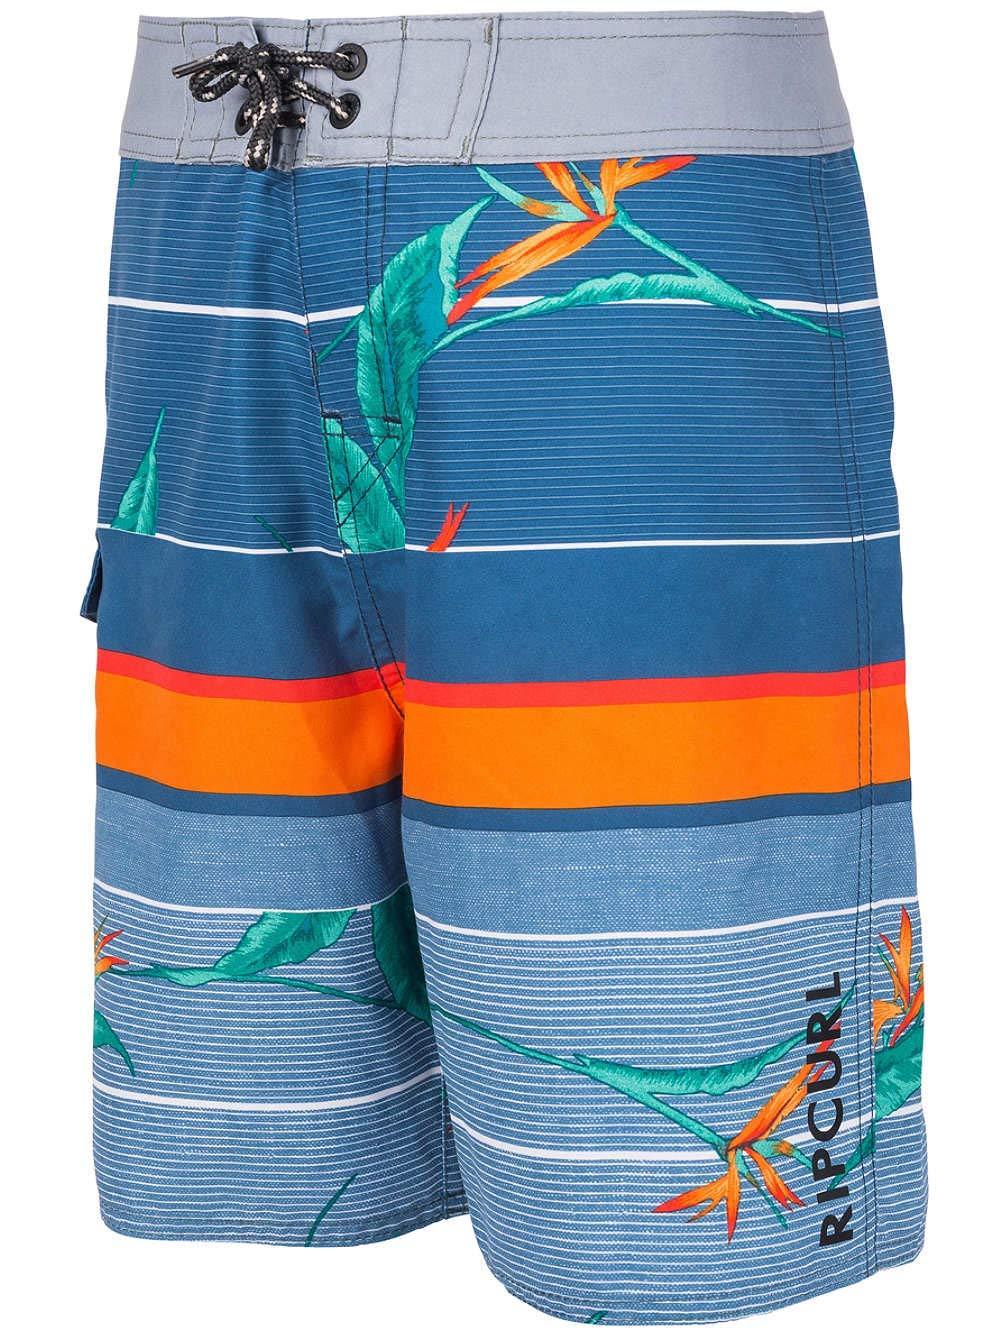 RIP CURL Kinder Boardshorts Dazz 17'' Boardshorts B07NLPHRNH Badeshorts Kunde zuerst